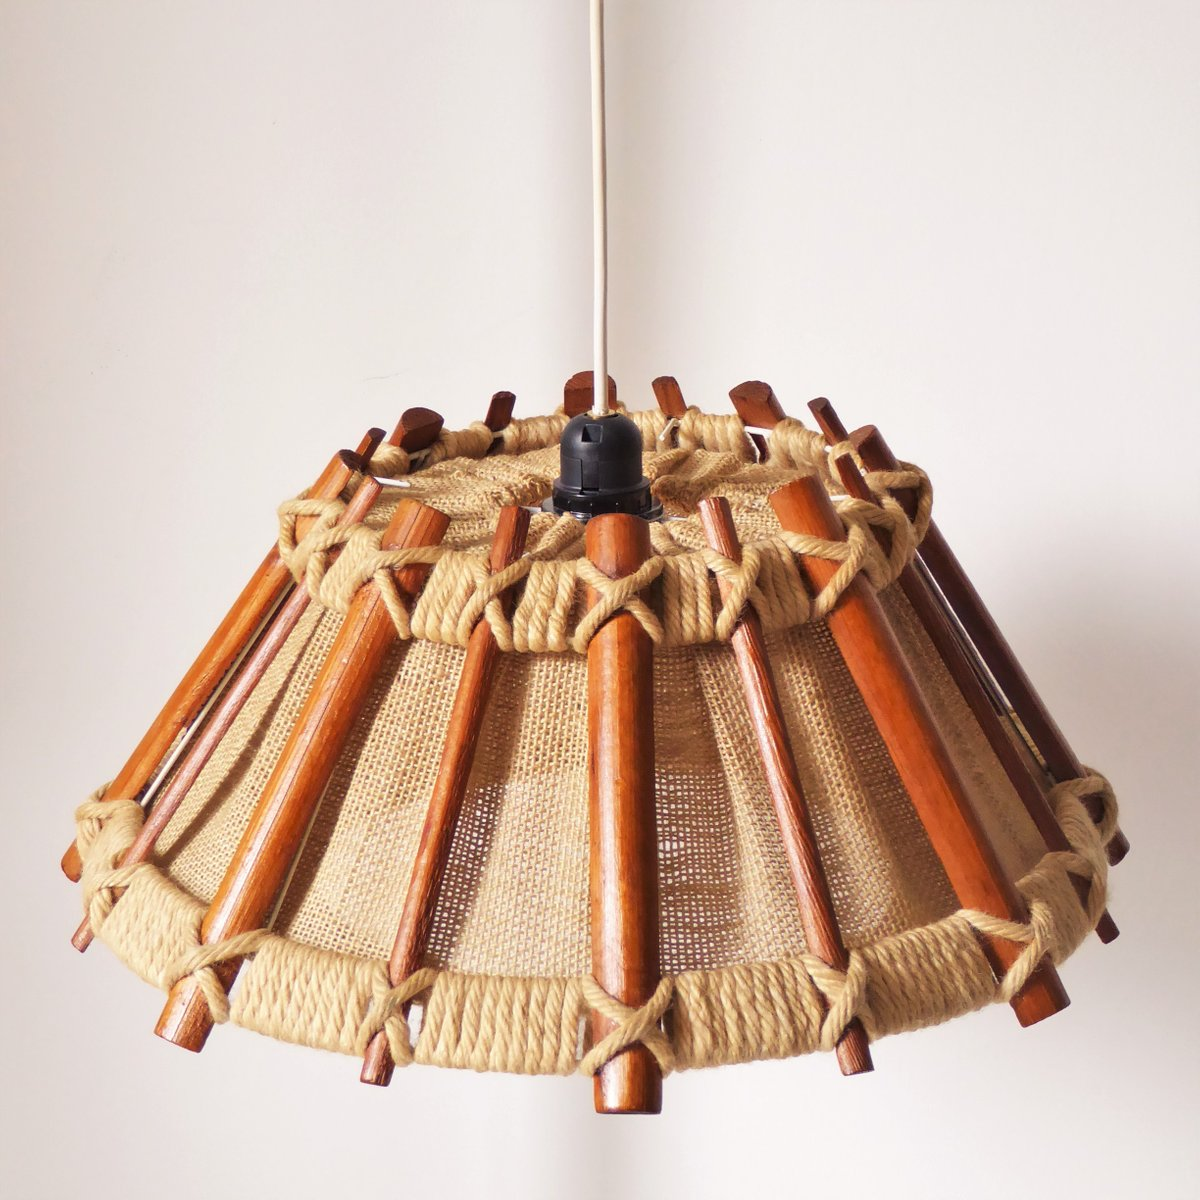 skandinavisch h ngelampe aus holz seil 1960er bei pamono kaufen. Black Bedroom Furniture Sets. Home Design Ideas